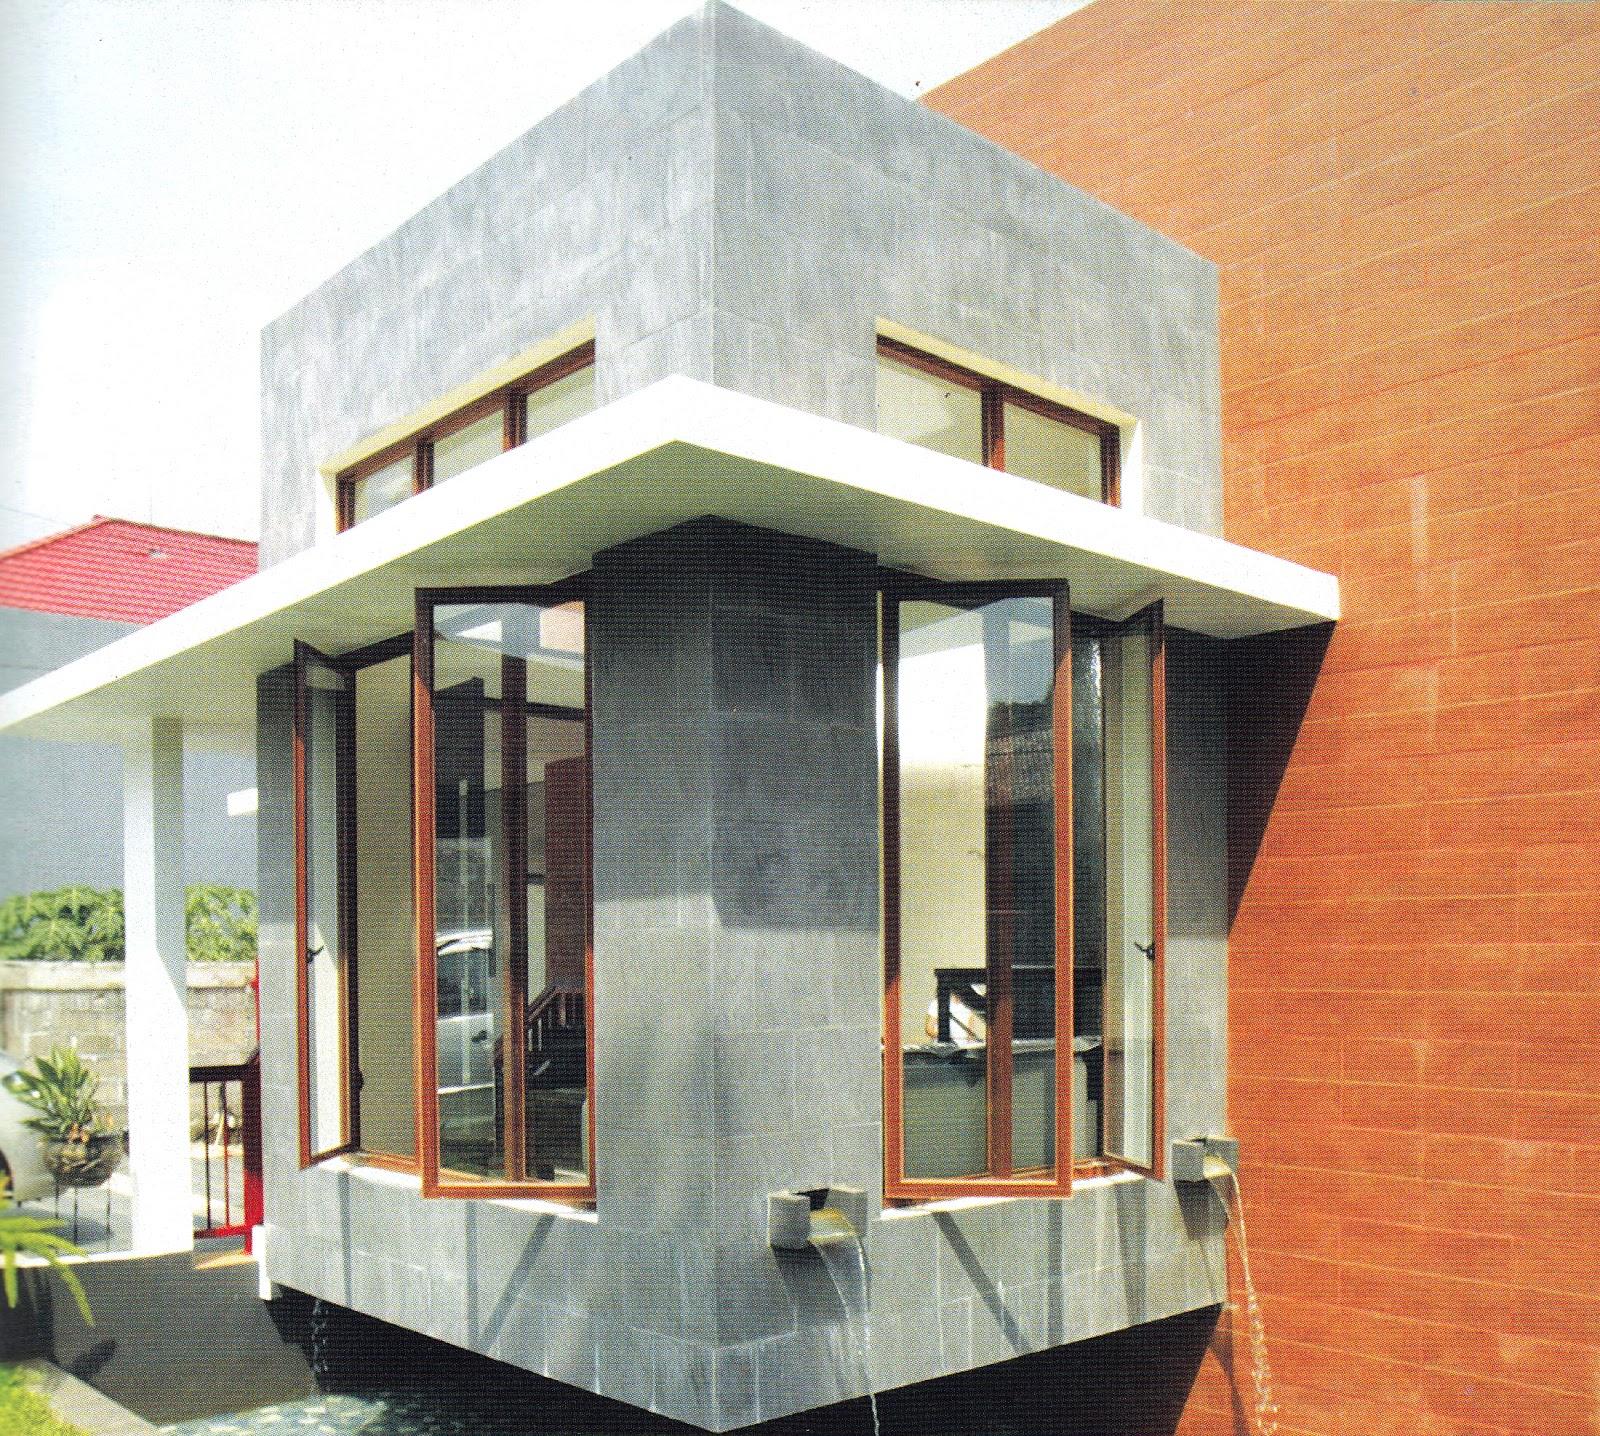 Dinding Penuh Jendela Ciptakan Kesejukan | Rumah Idaman Kita